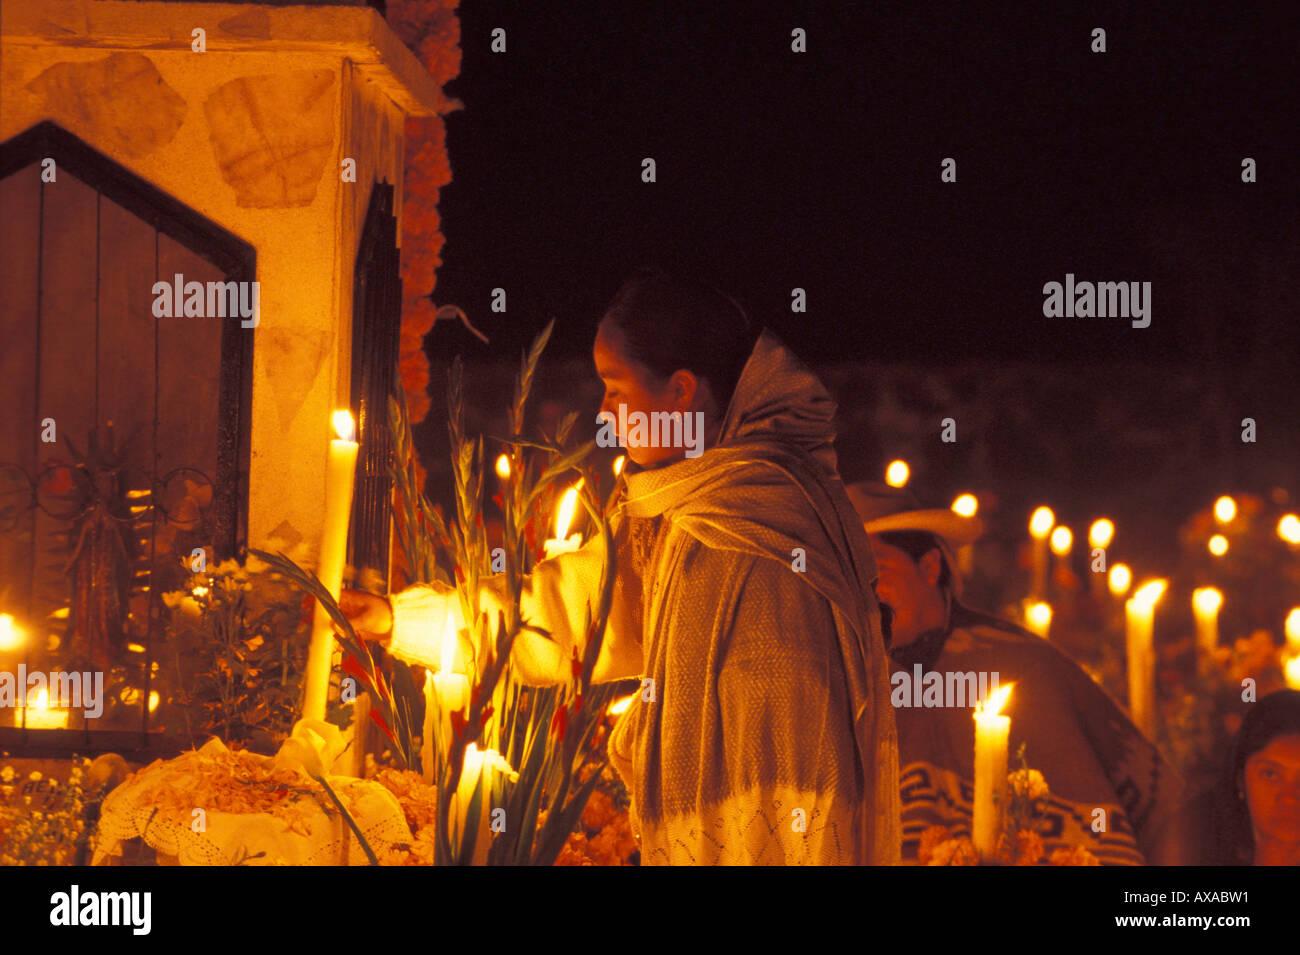 Gedenken am Tag der Toten, Mittelamerika Mexico - Stock Image